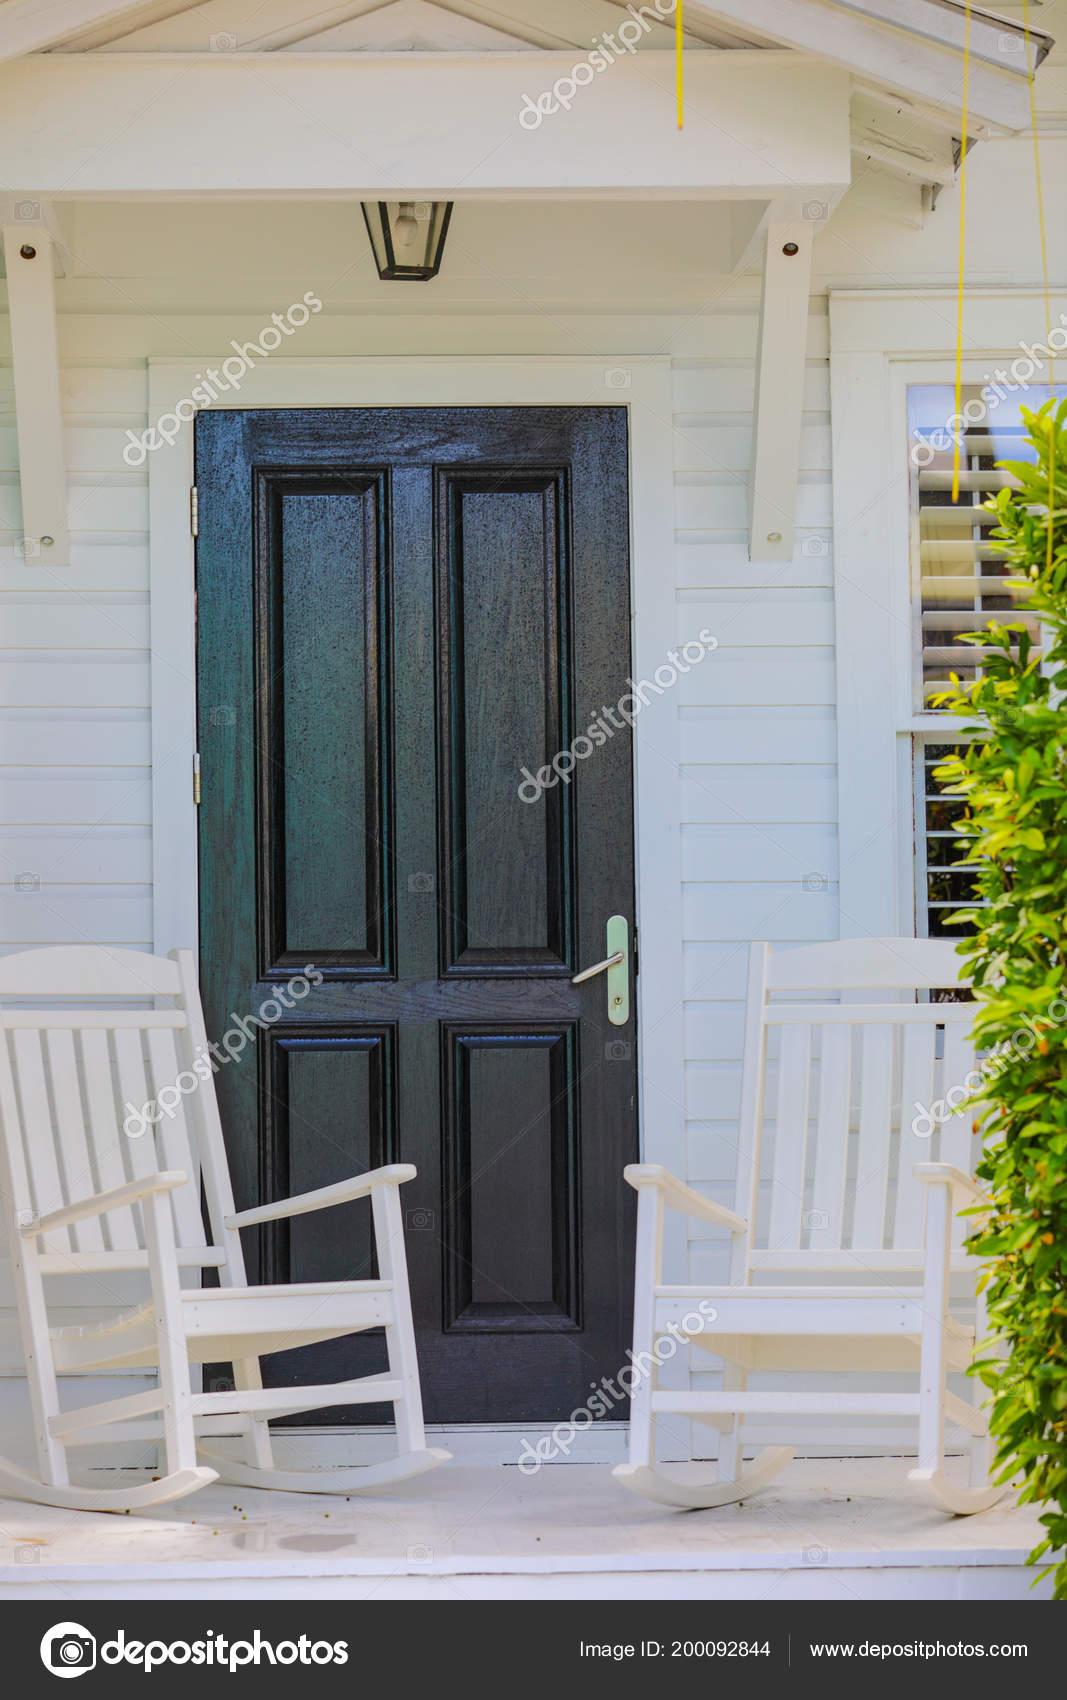 b2f4a2ef9 Puerta Casa Con Sillas Mecedoras — Fotos de Stock © felixtm #200092844